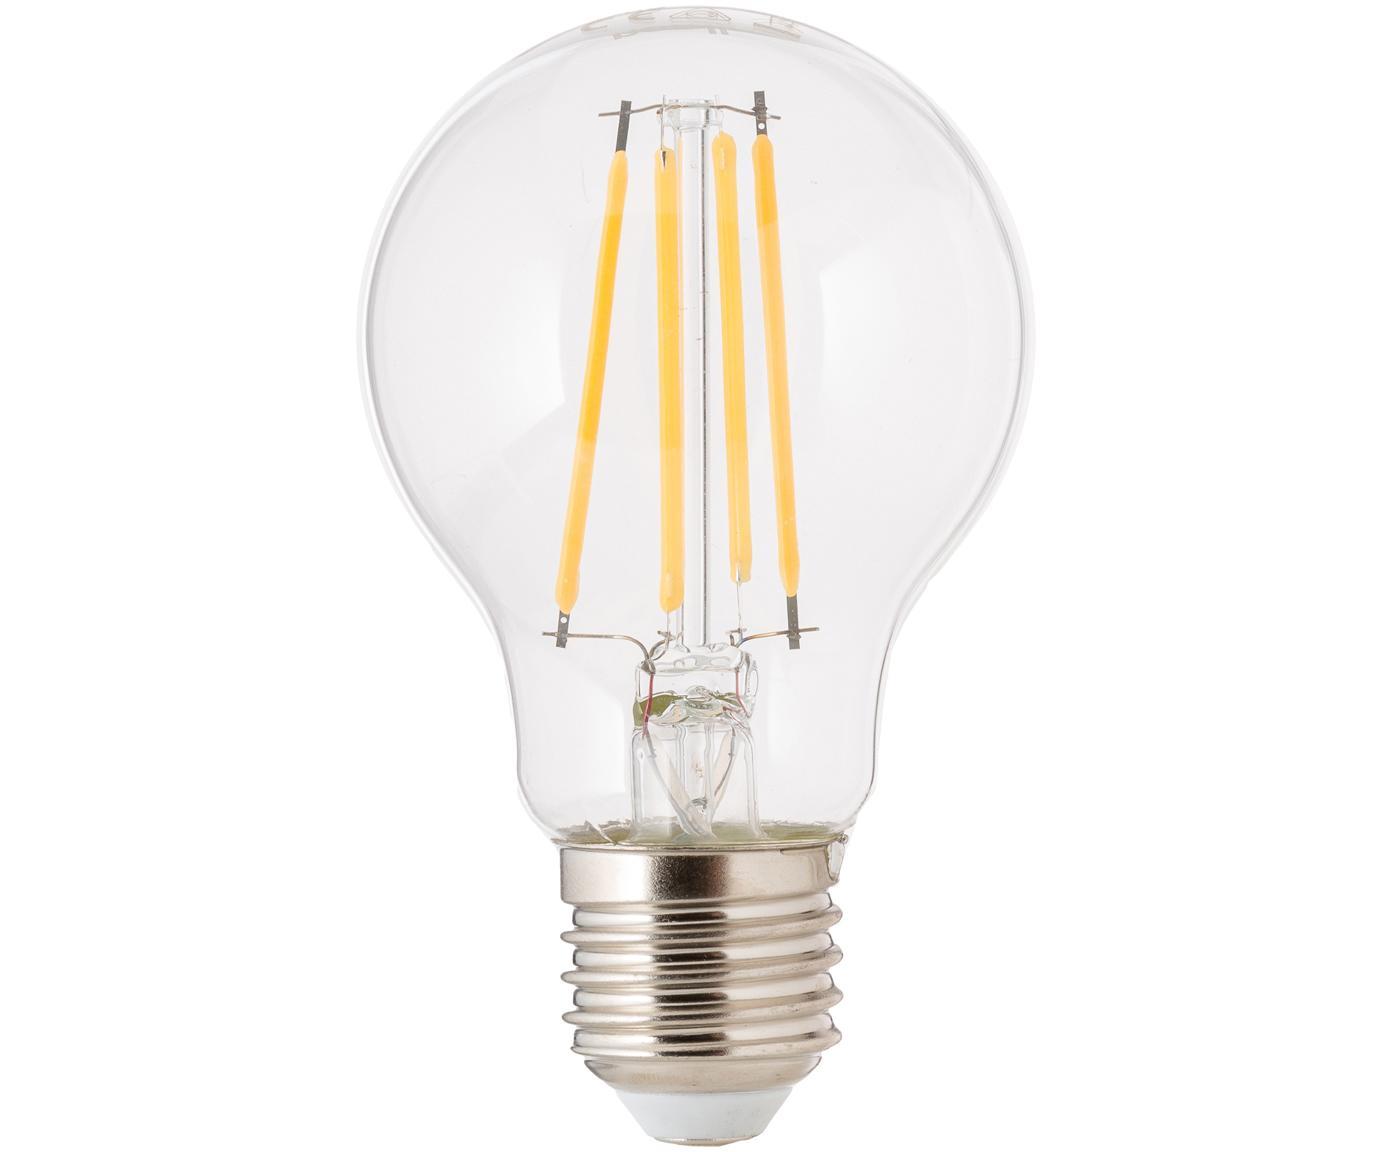 Lampadina dimmerabile Cherub (E27 / 8Watt), Lampadina: vetro, Trasparente, Ø 8 x Alt. 10 cm